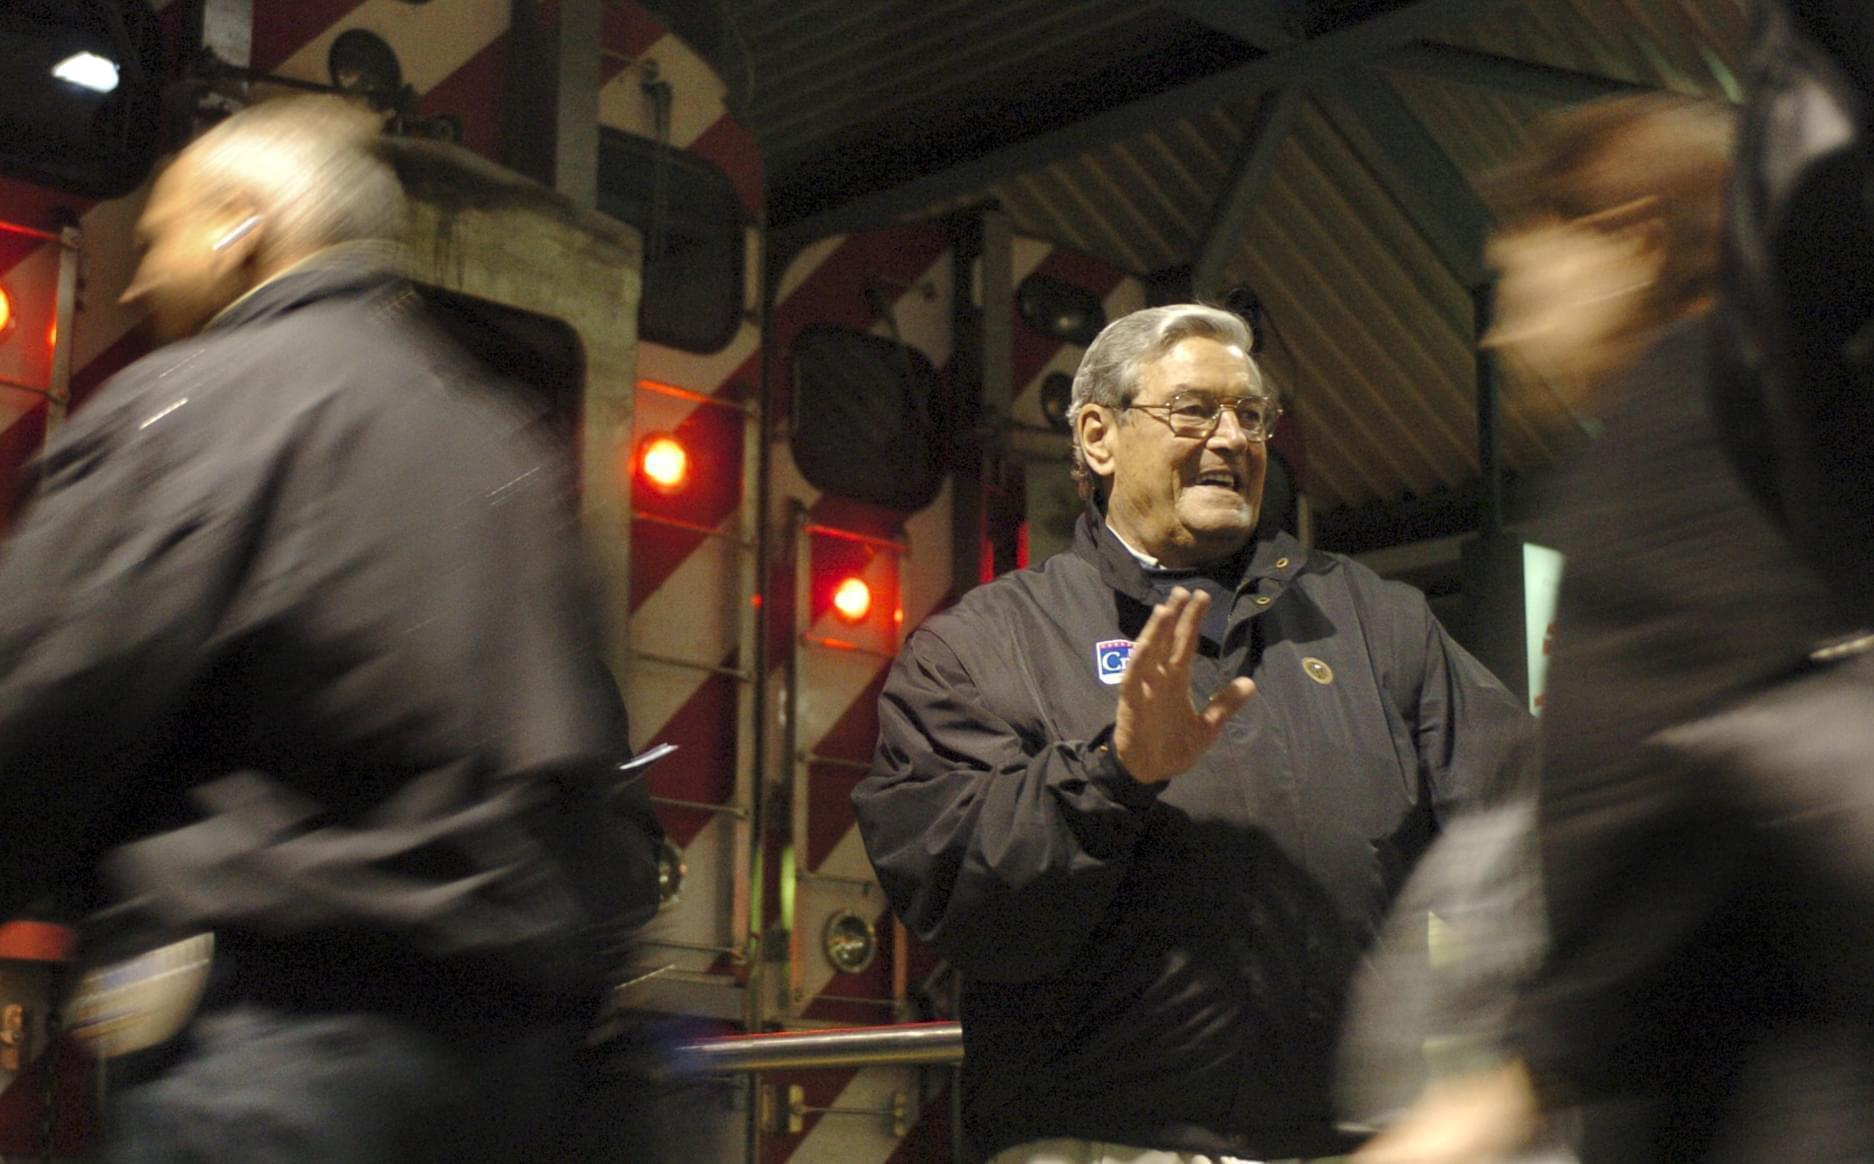 Former Illinois Congressman Phil Crane in 2004 photo